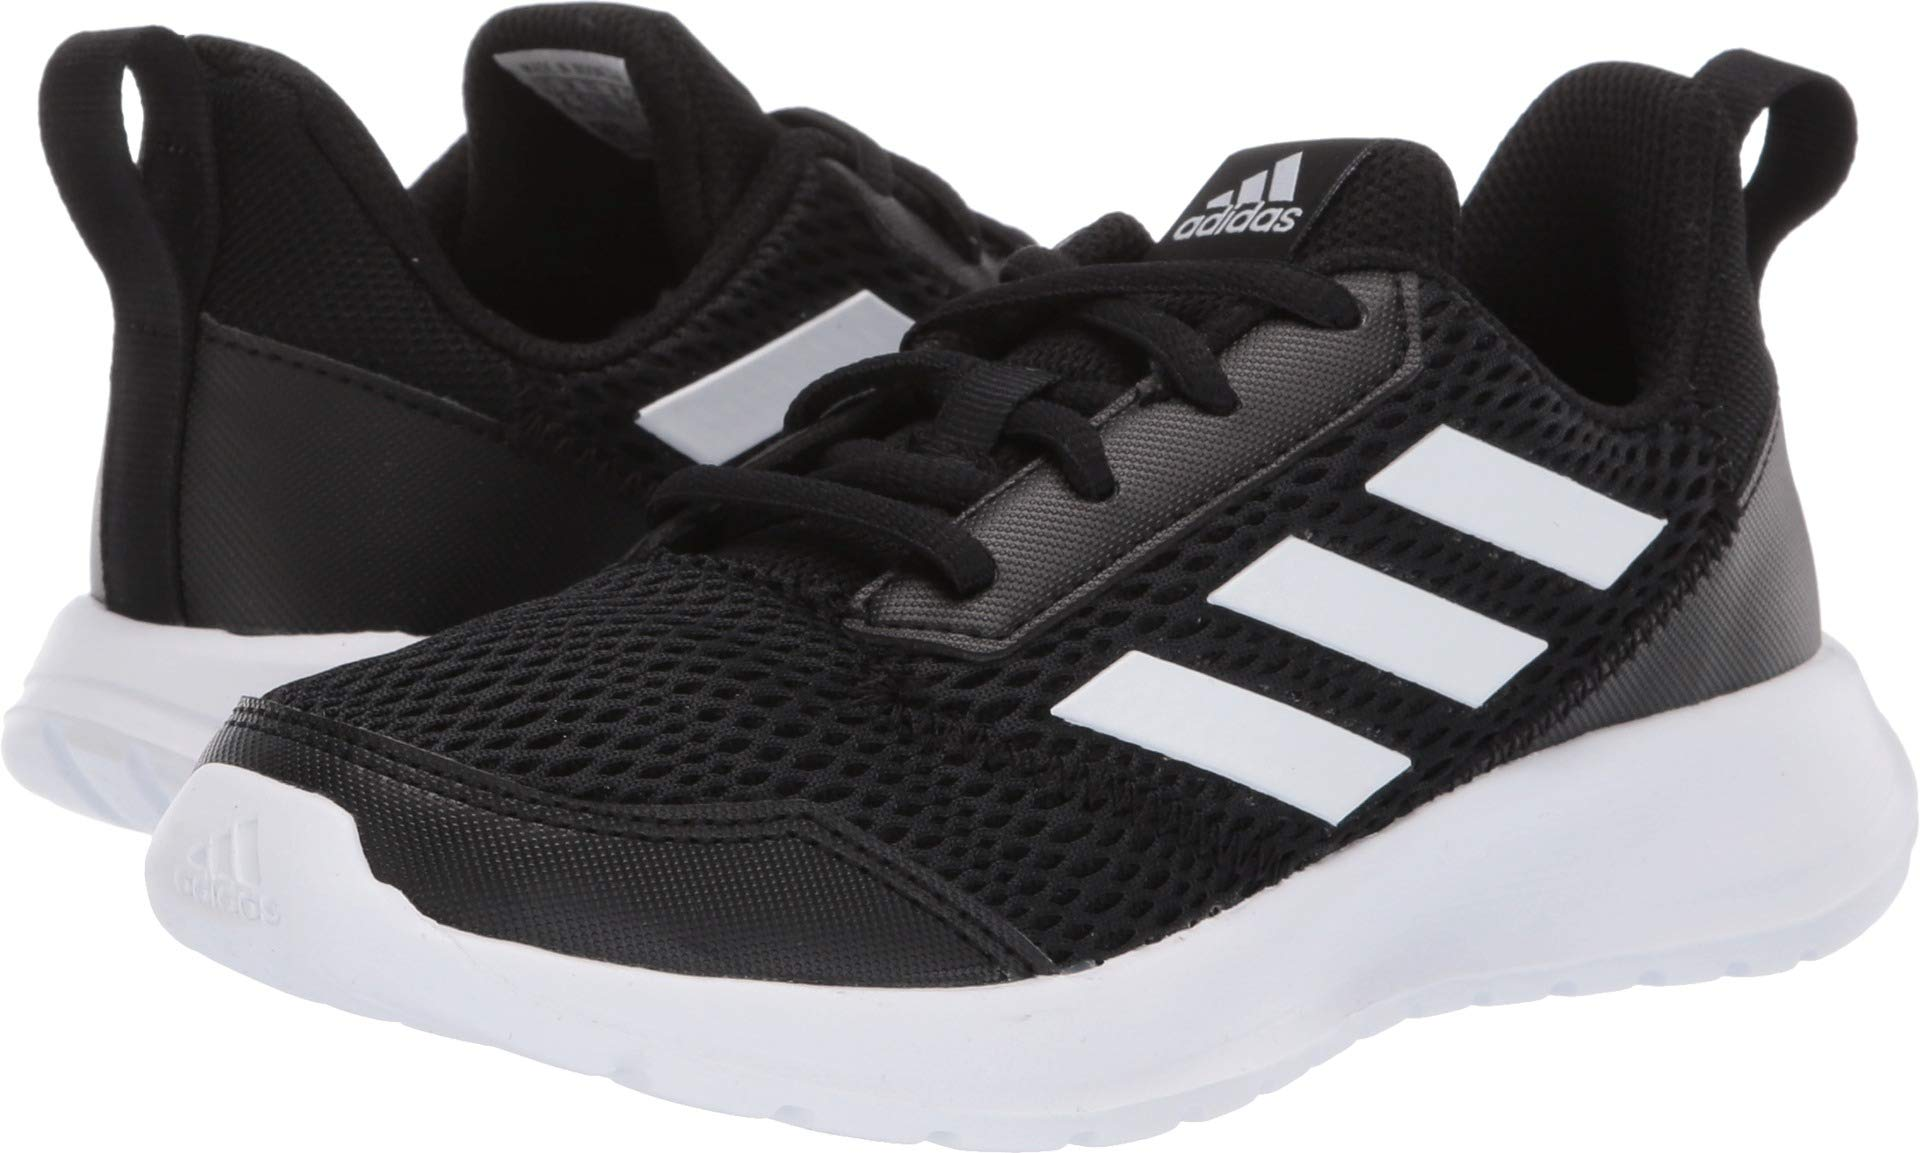 adidas Kids' Altarun, Black/White/Black, 11K M US Little Kid by adidas